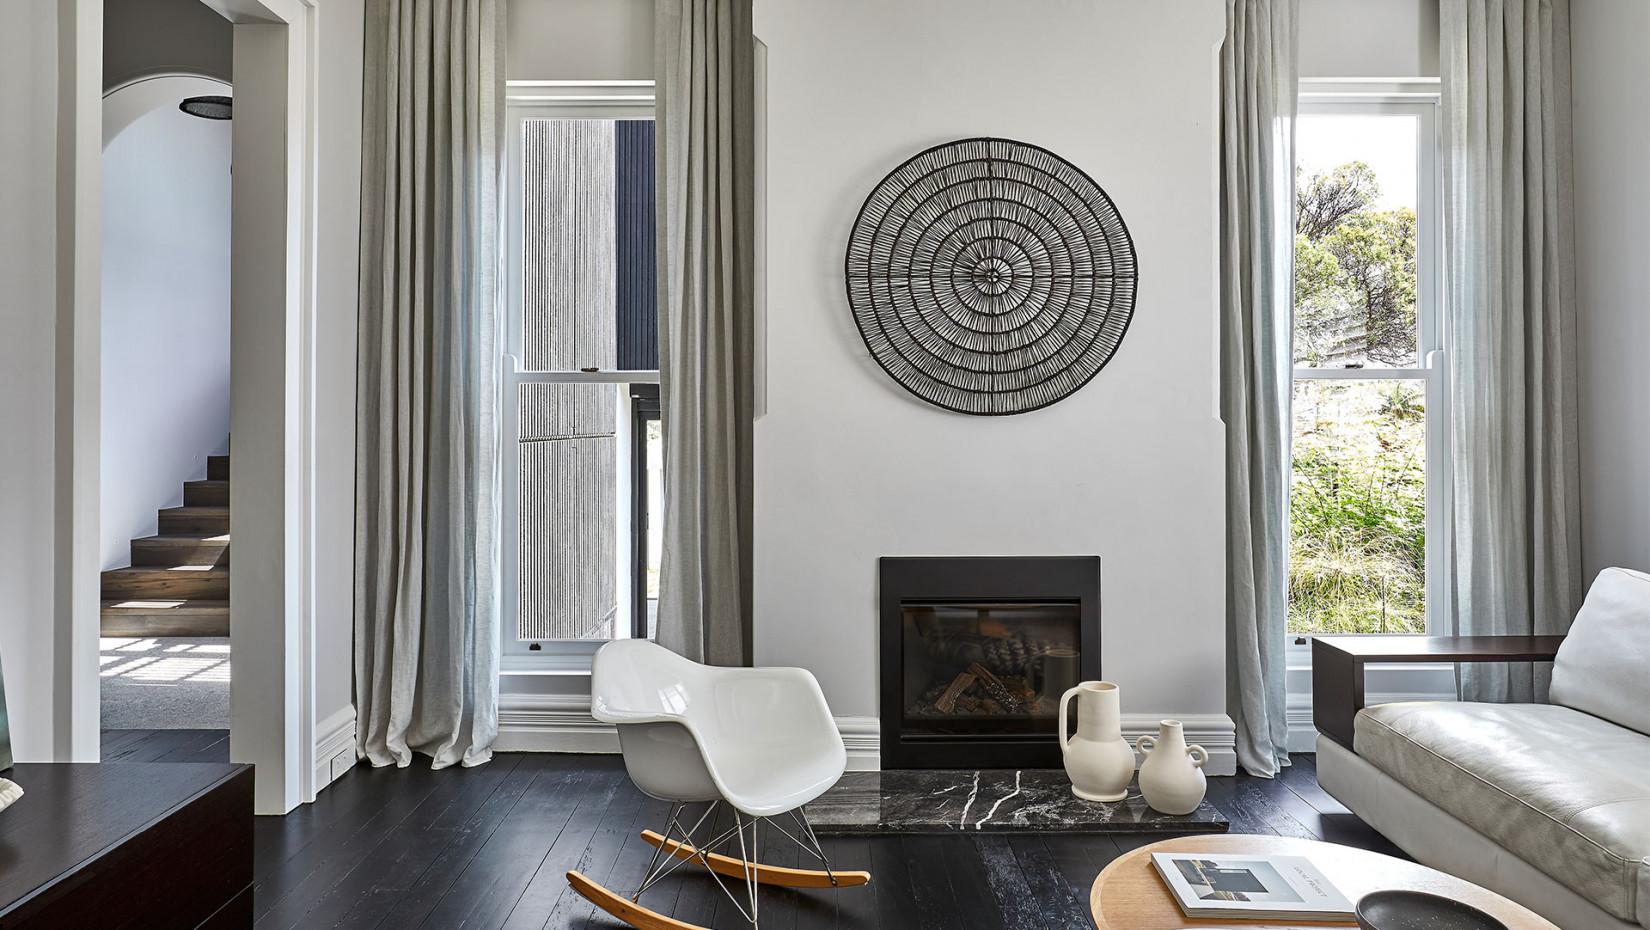 Дом по проекту Daniel Boddam Studio: тепло, тишина и покой